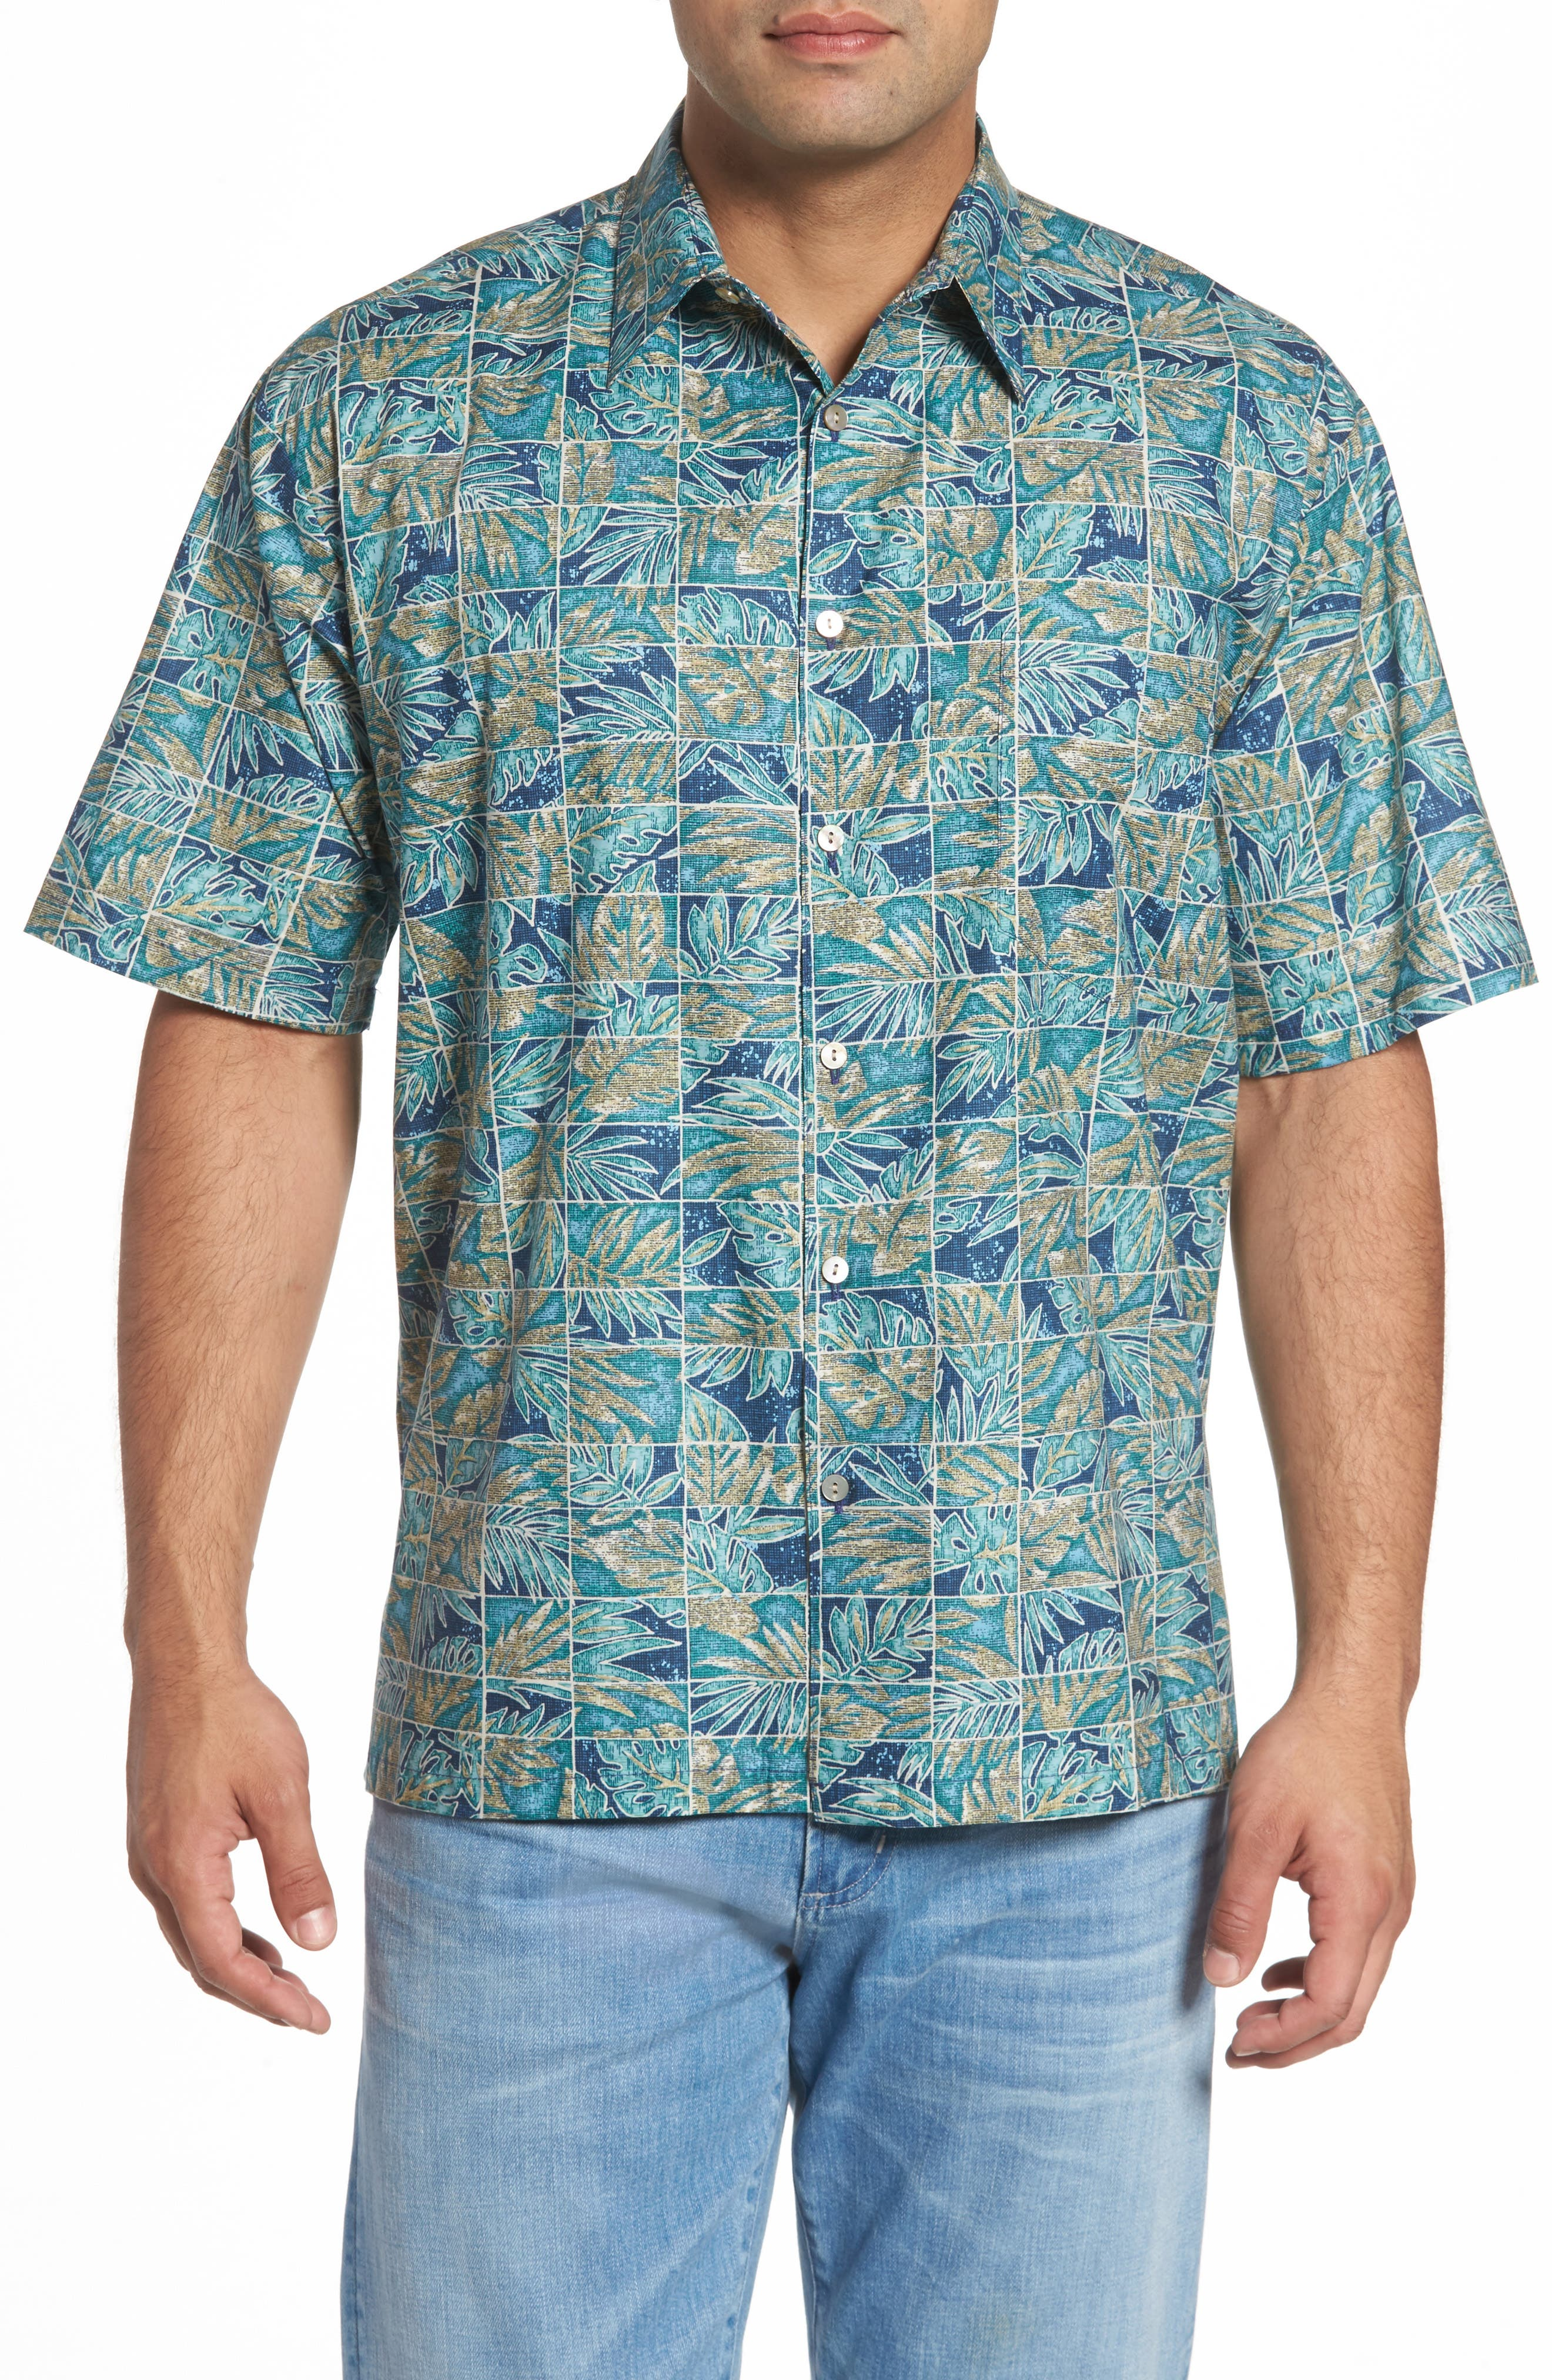 Tori Richard Mix-N-Match Classic Fit Camp Shirt